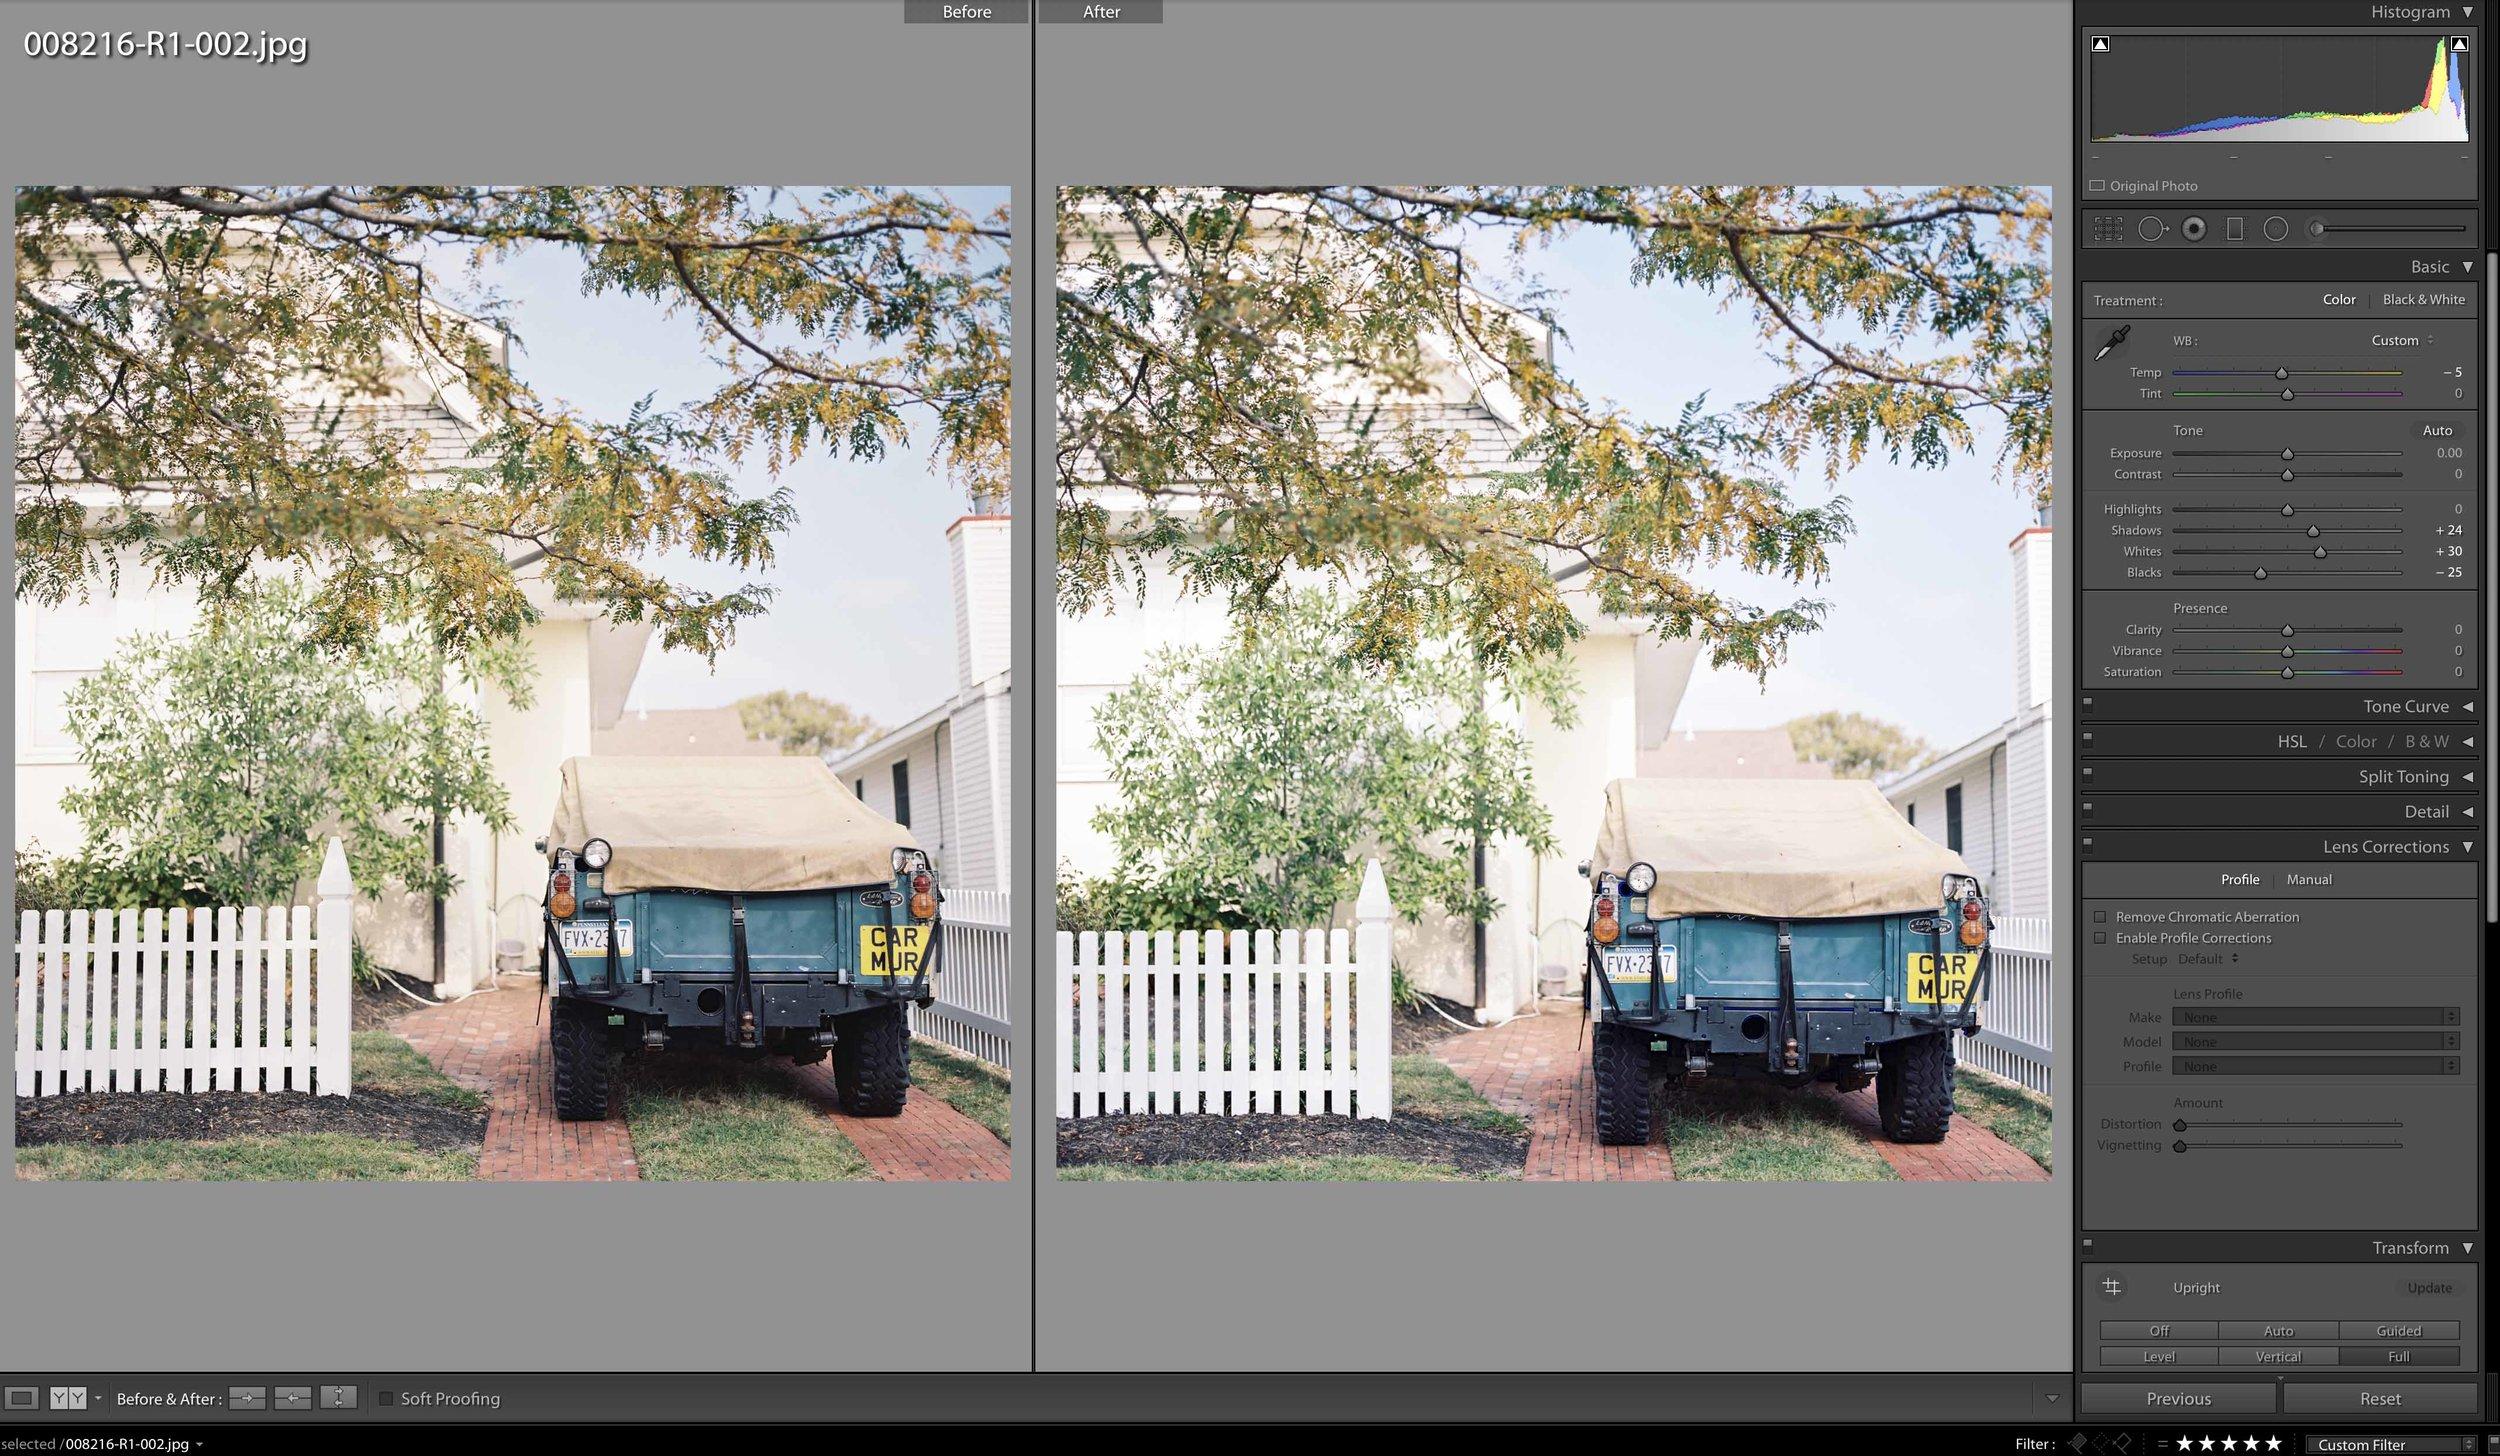 Hasselblad 500 C/M, Carl Zeiss Planar T* 2.8/80, Kodak Portra 400,Rated @ 200 ISO